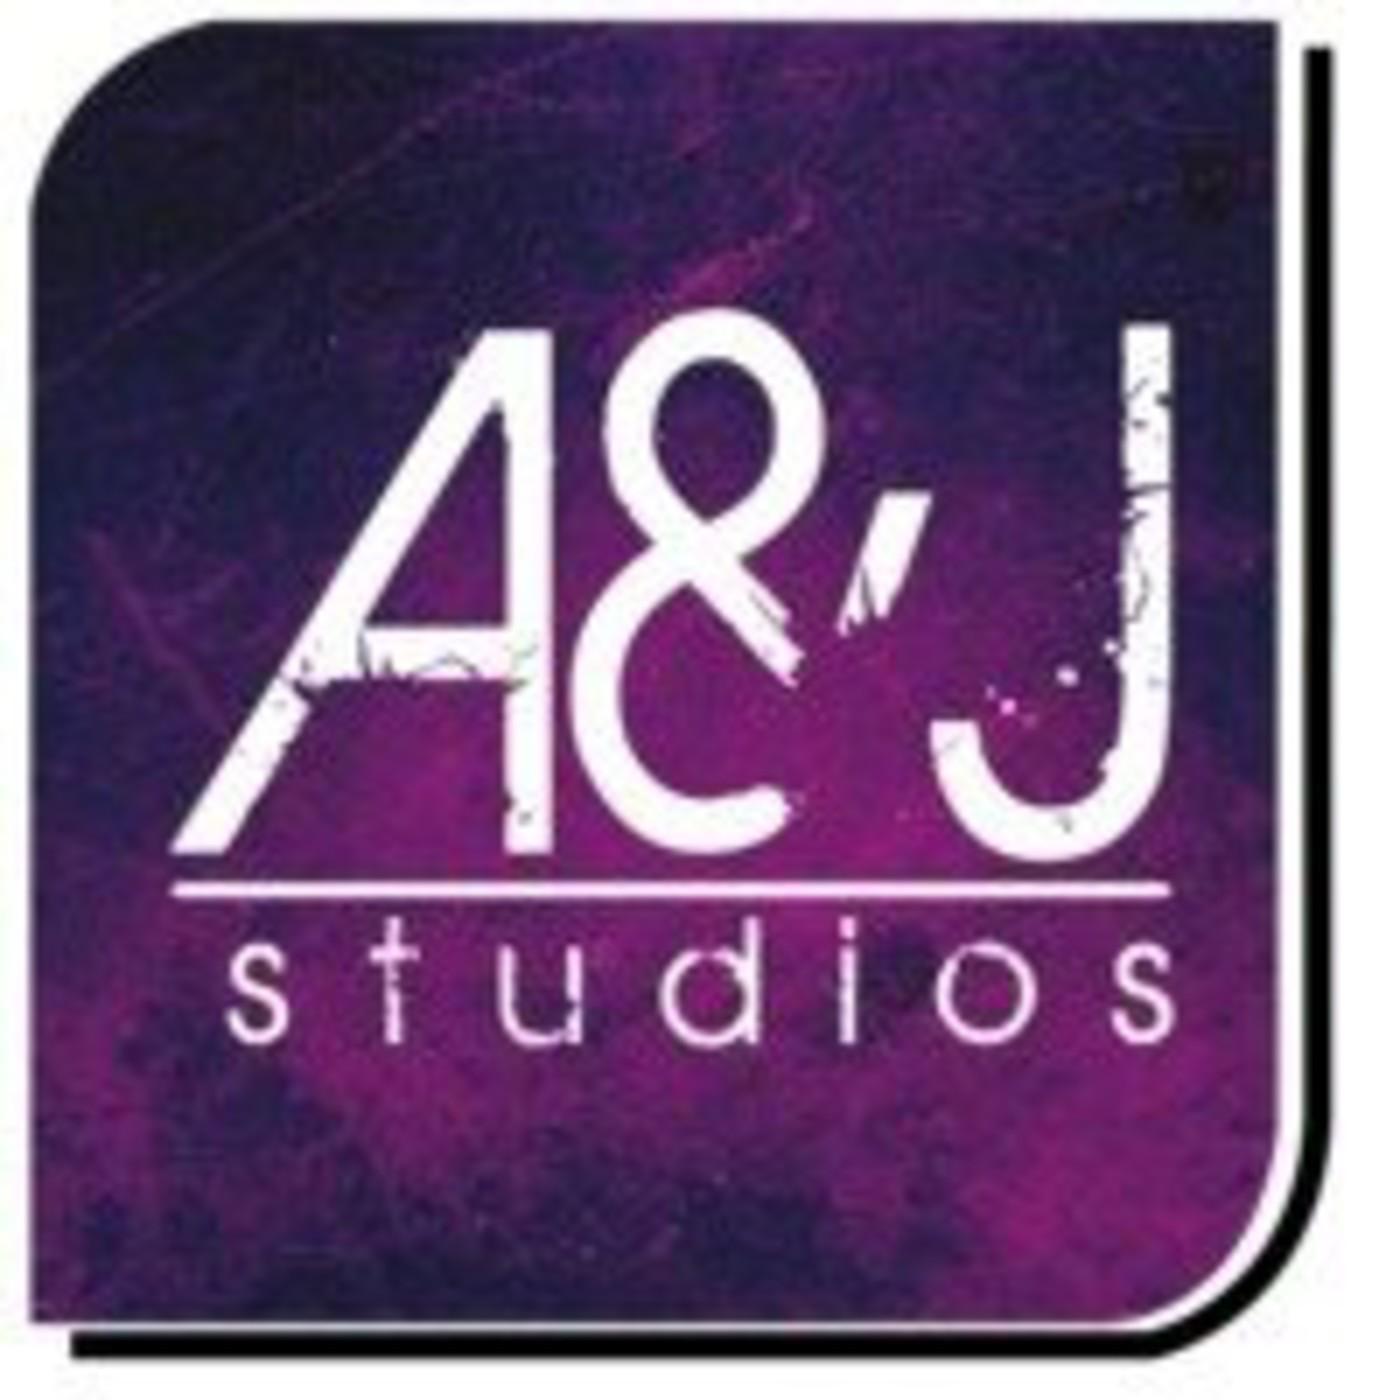 <![CDATA[Podcast A&Jstudios]]>